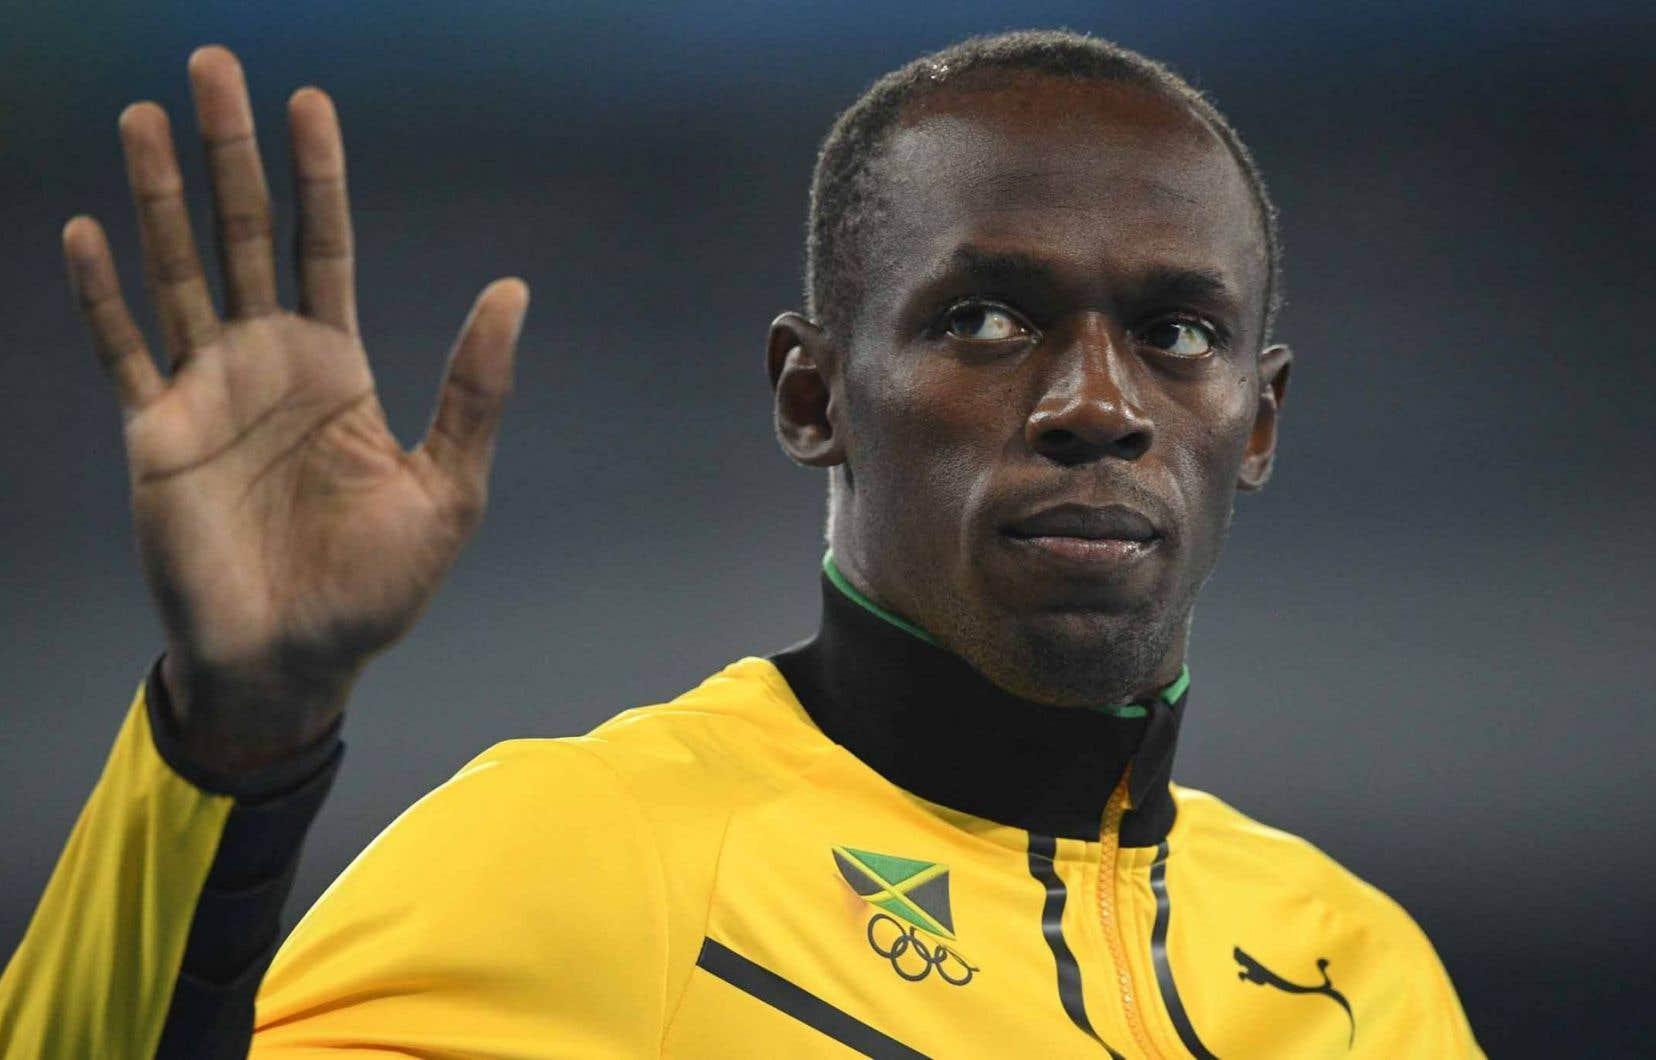 L'octuple champion olympique Usain Bolt